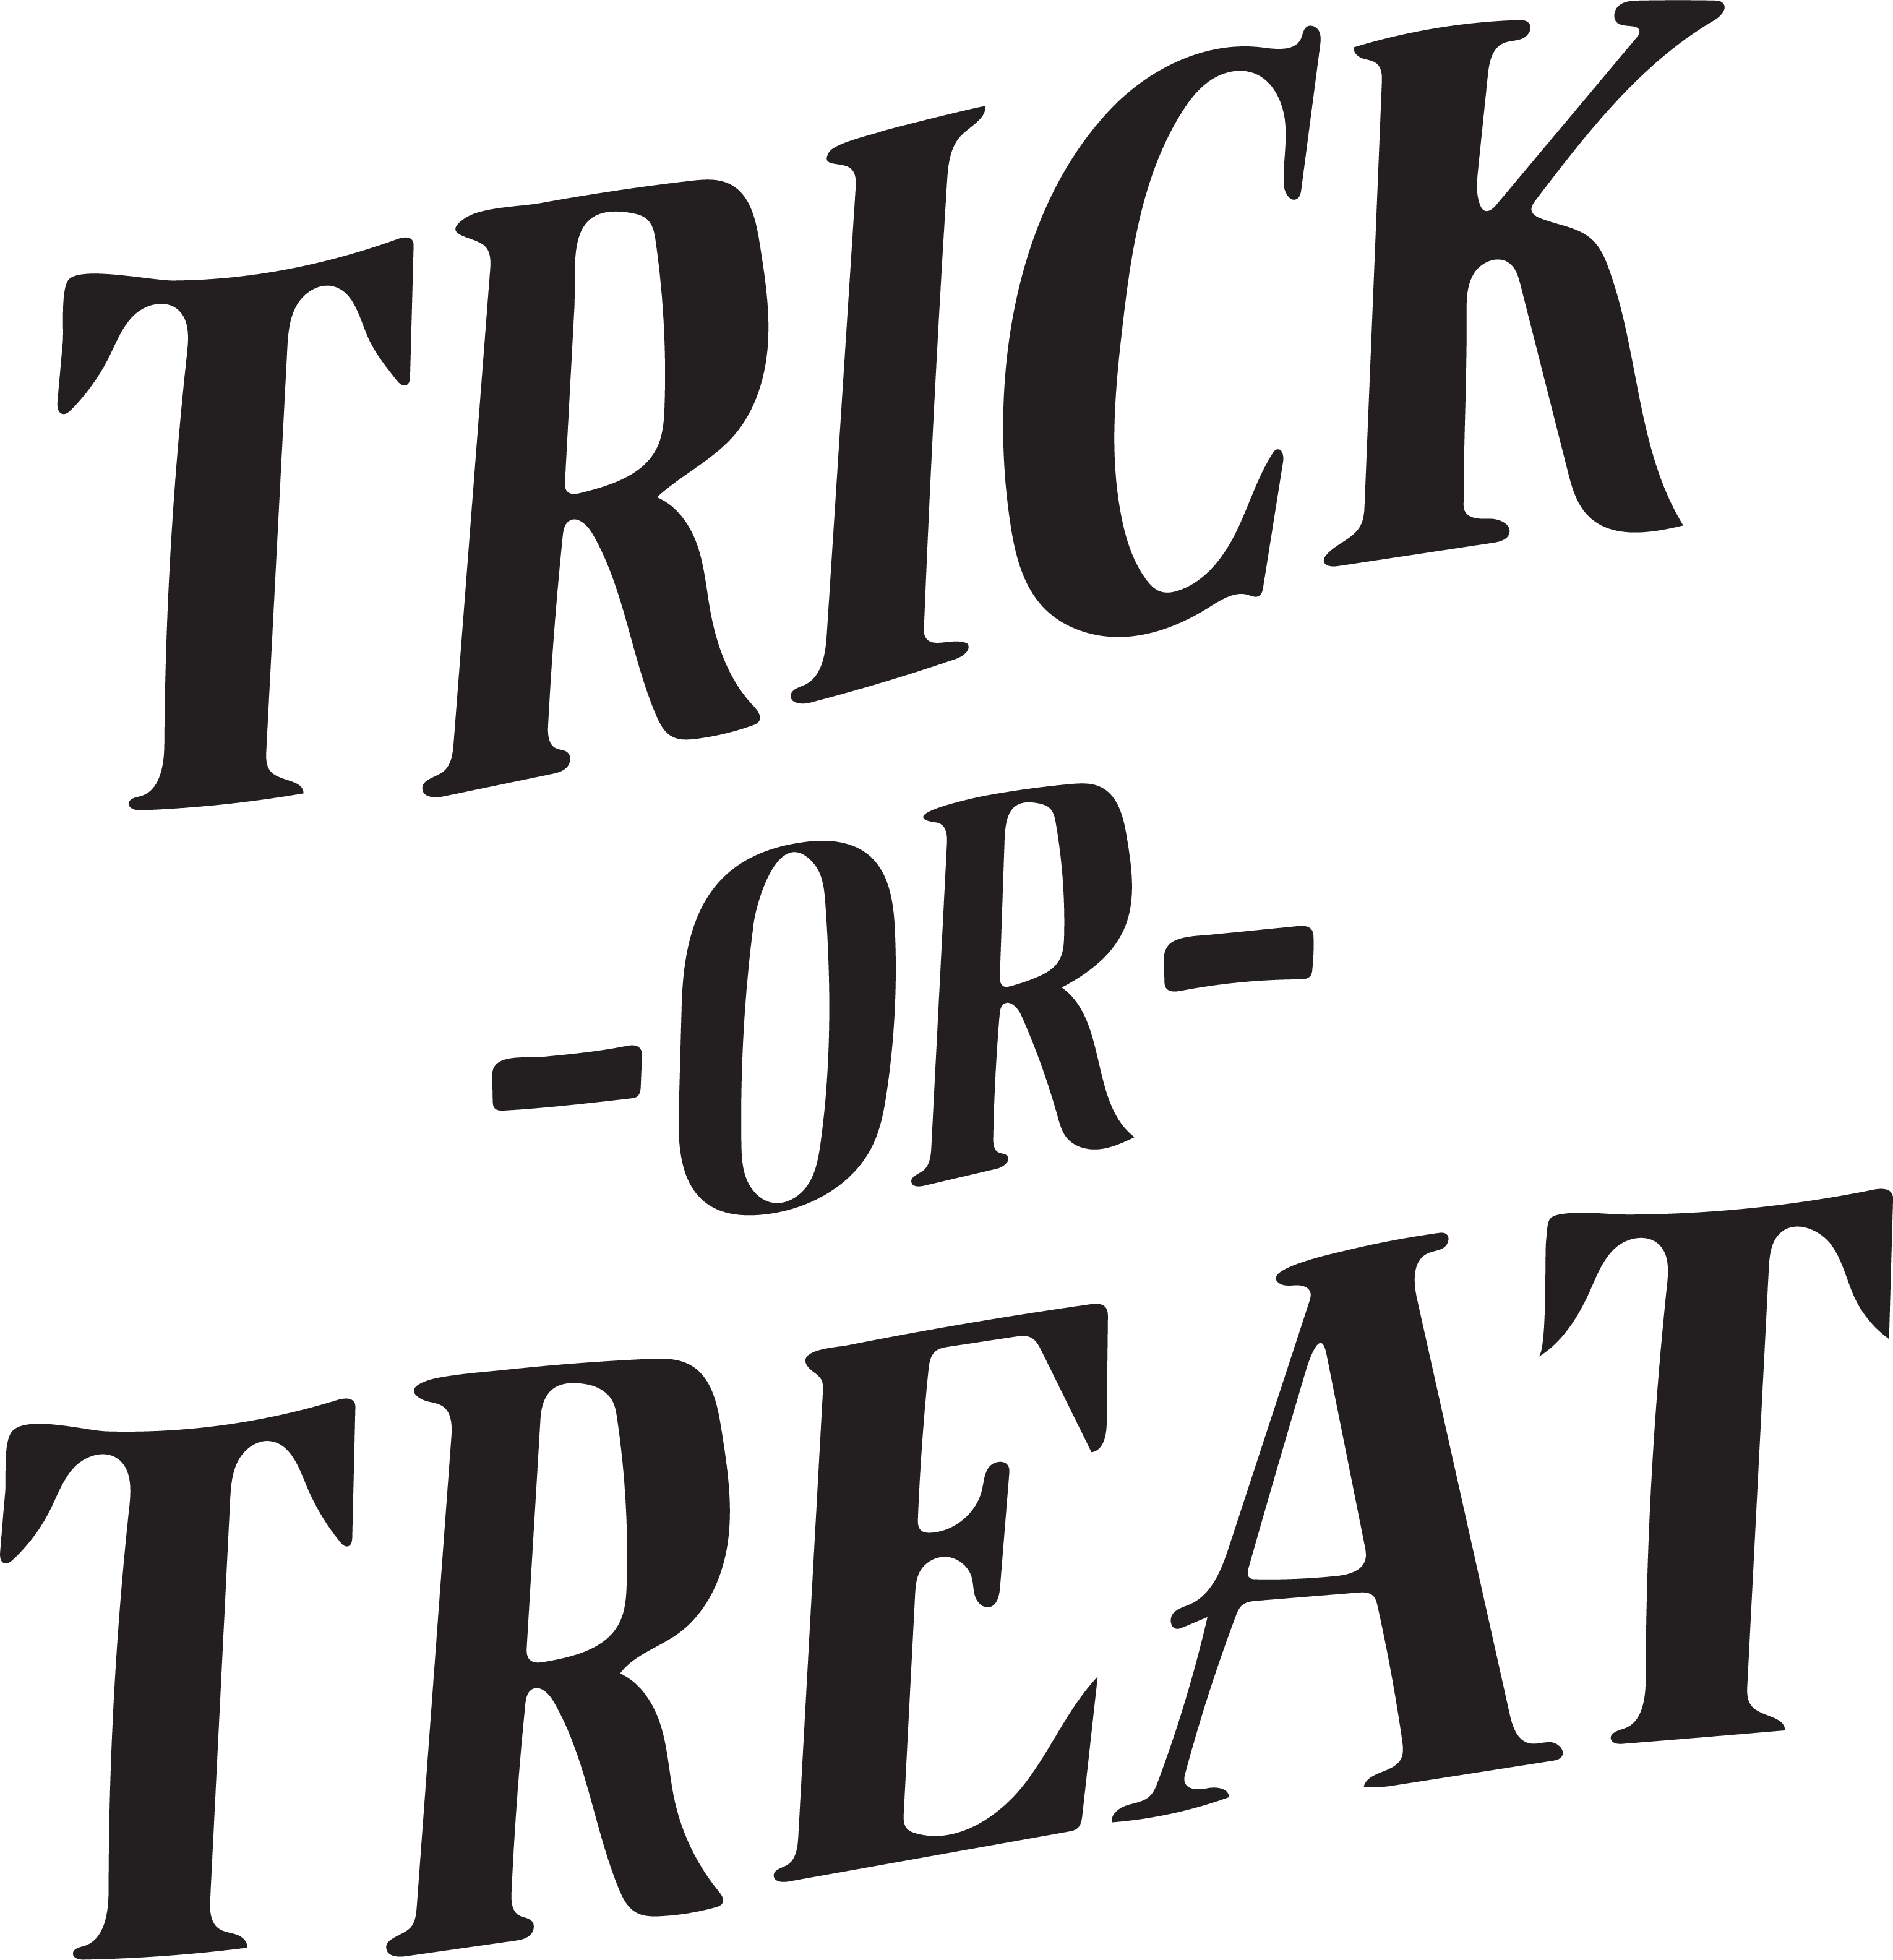 Trick -Or- Treat SVG Cut File